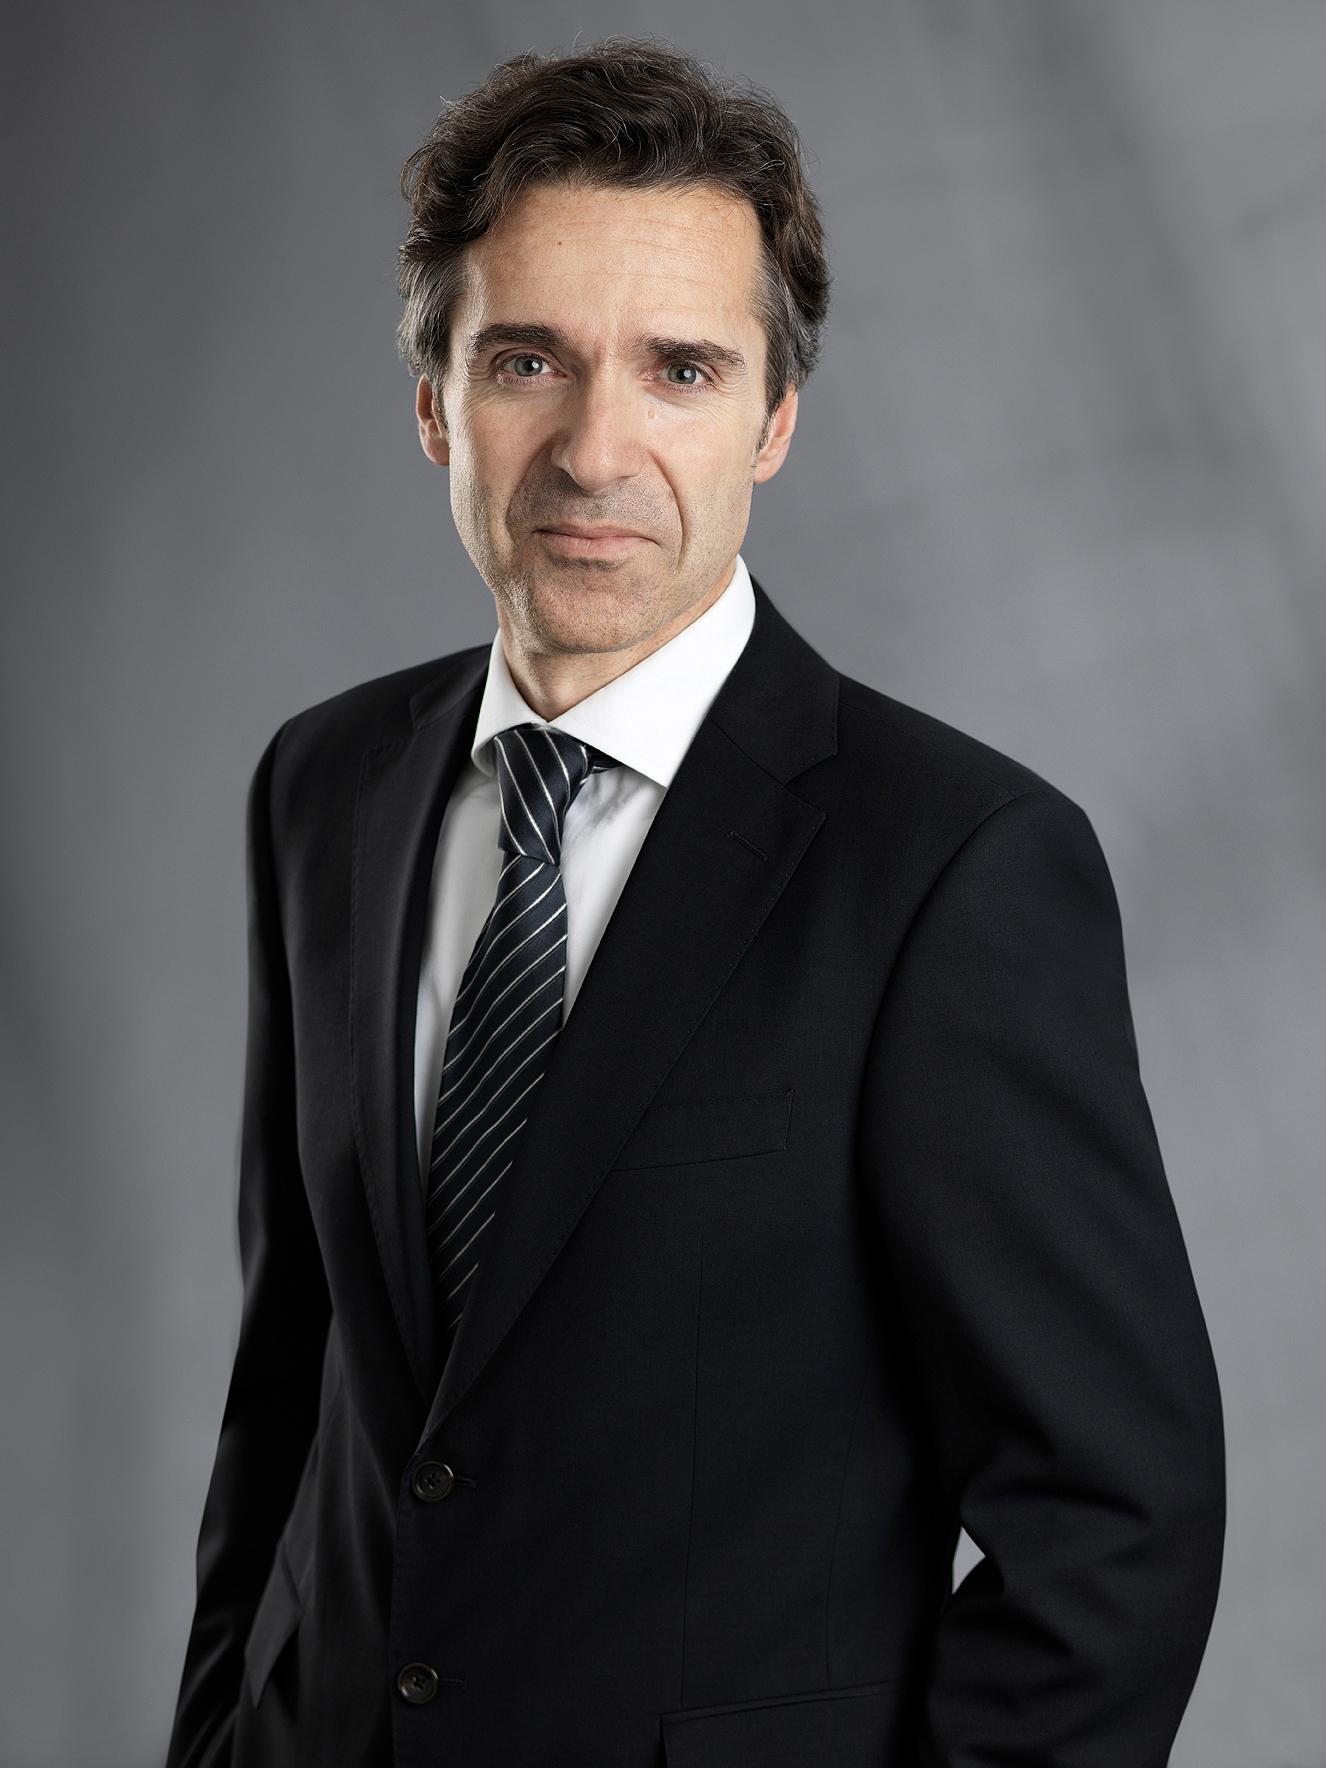 Marc Metzger